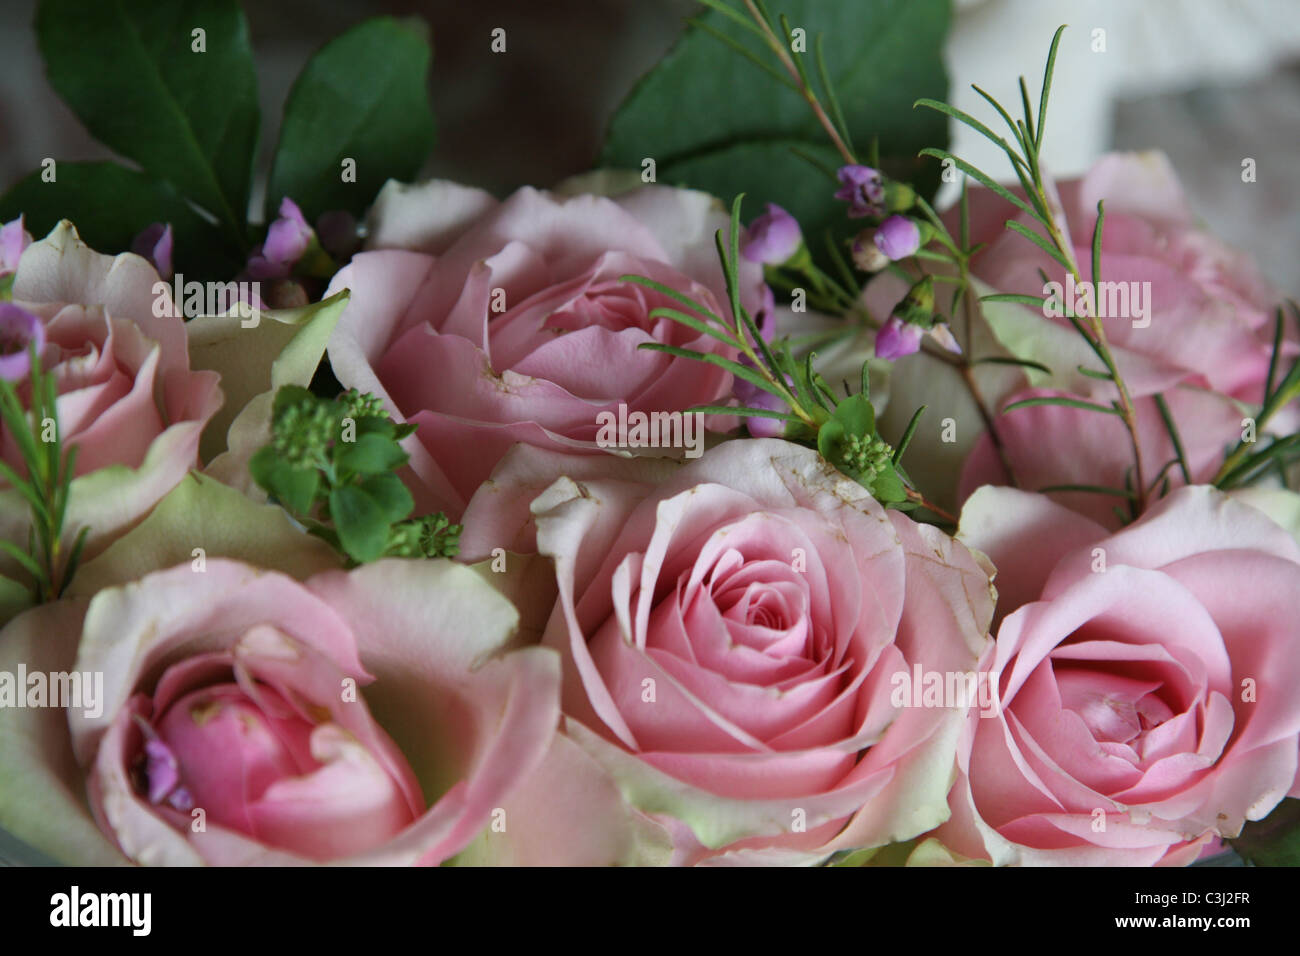 Blumenstrauss, rosa Rosen, Blumenboquet, Bouquet, pink roses Stock Photo